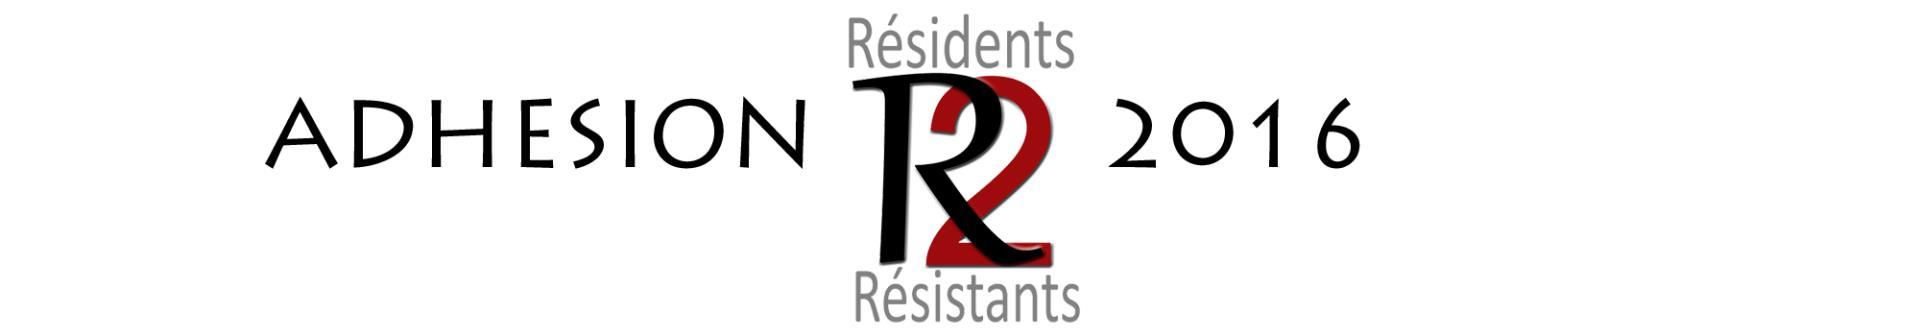 Adhésion R² 2016 - RESIDENTS RESISTANTS